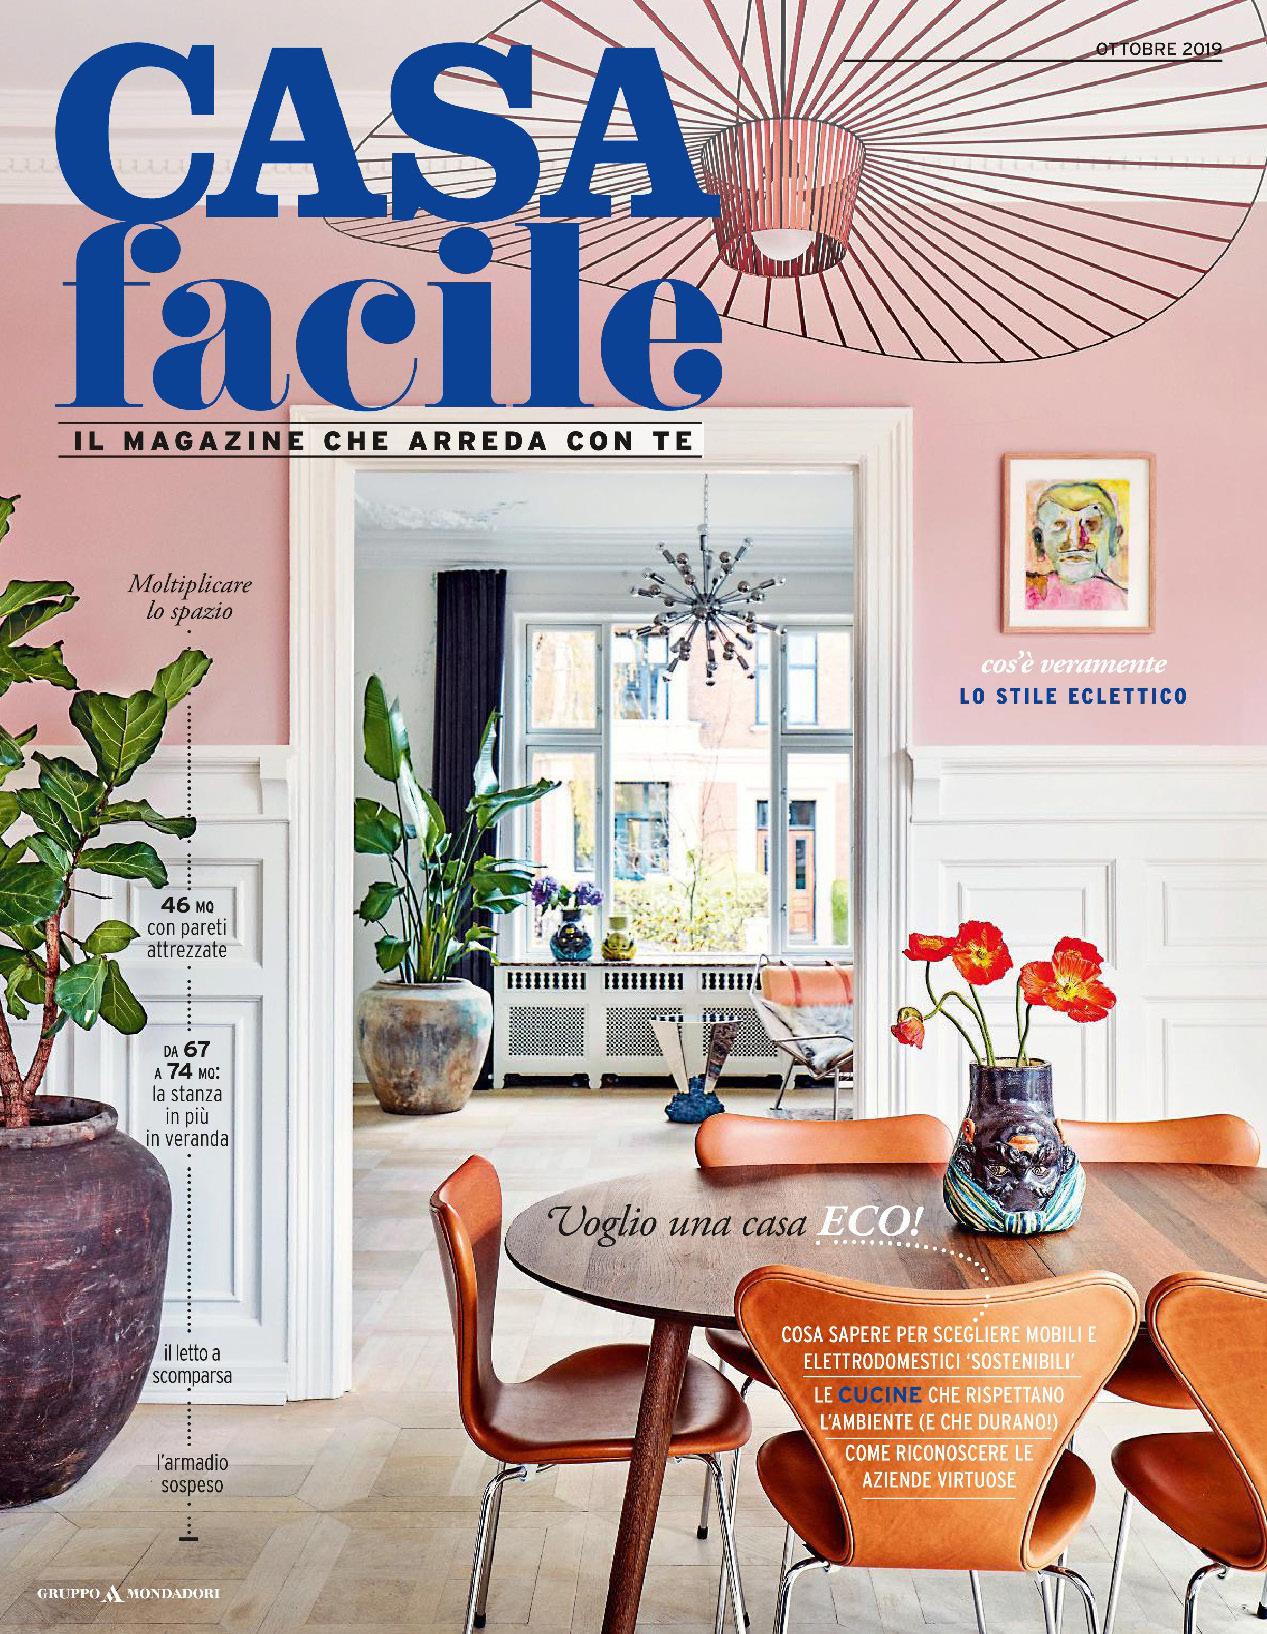 《Casa Facile》意大利家居空間裝飾藝術雜志2019年10月號